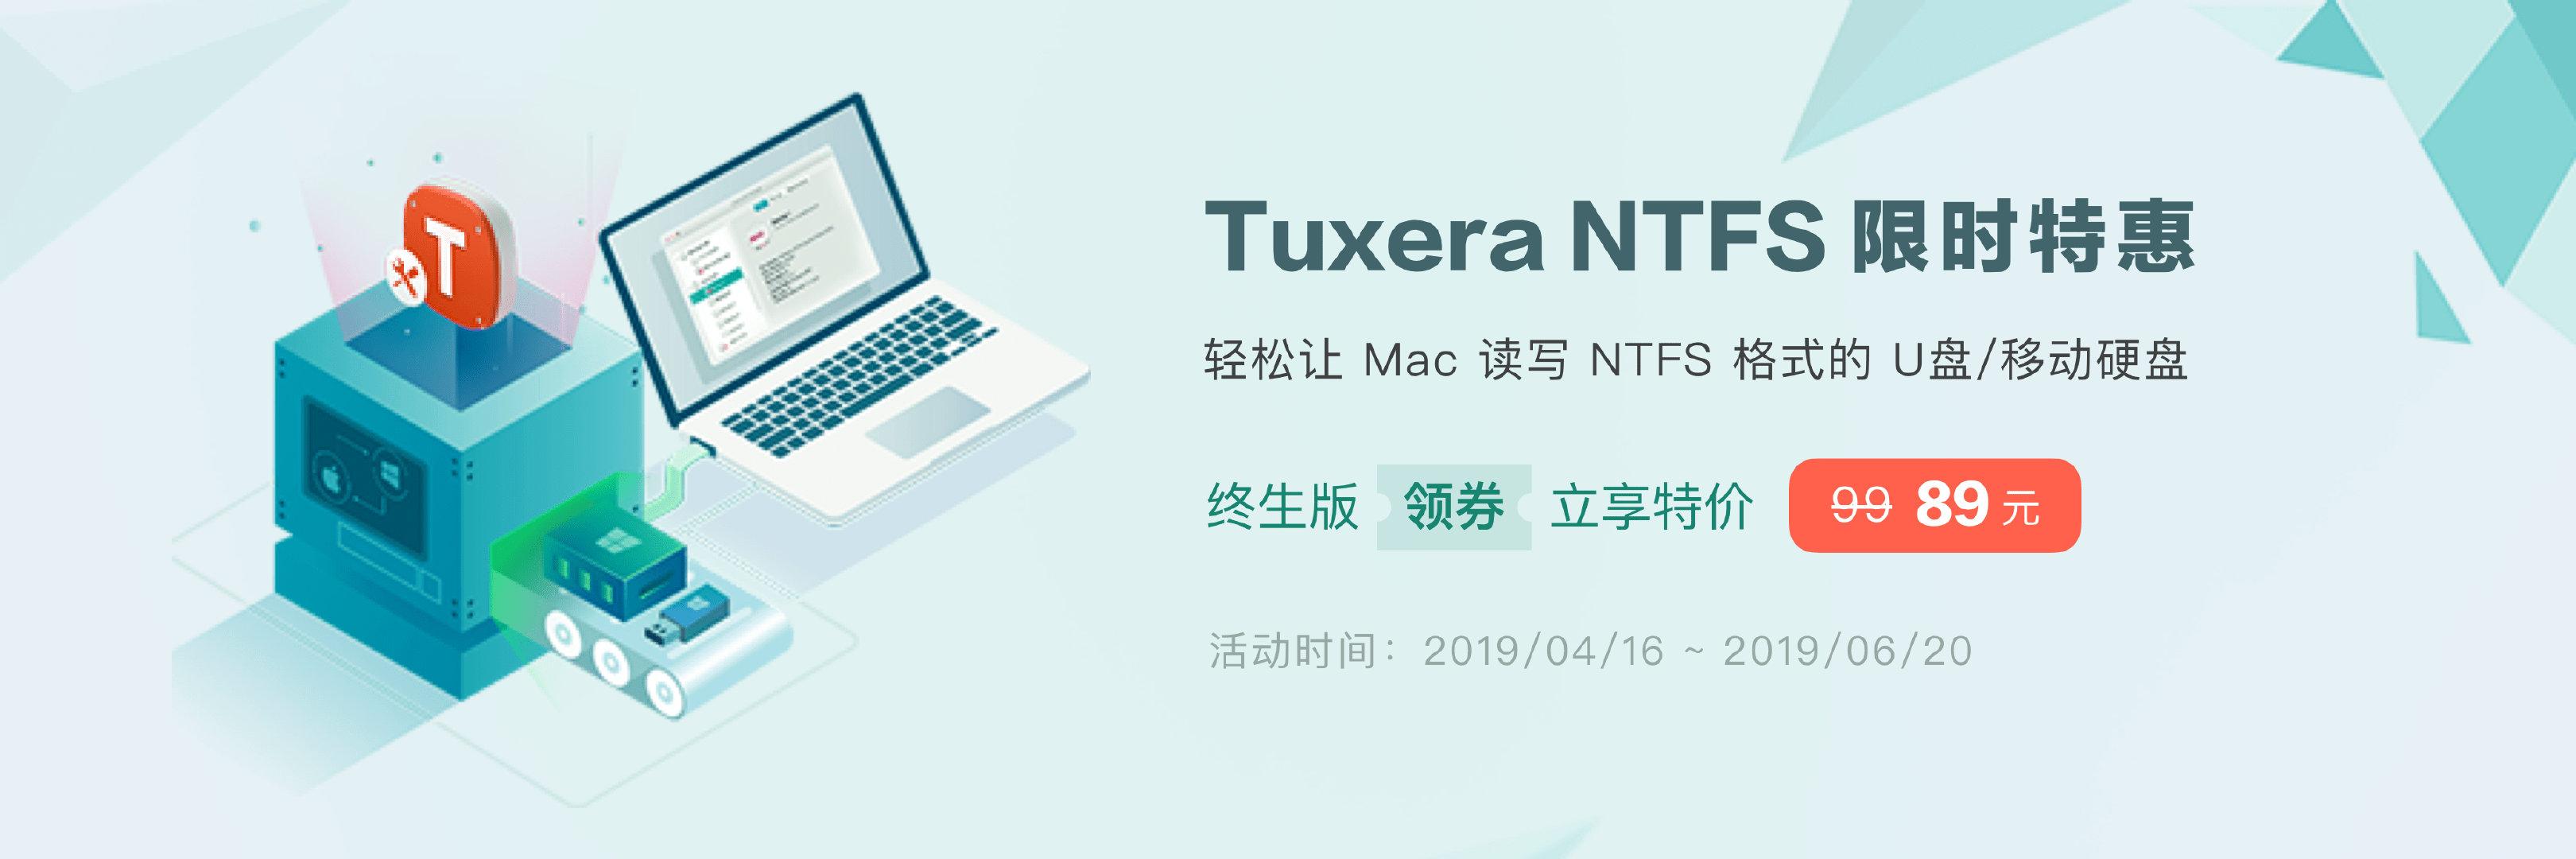 Tuxera NTFS For Mac 限时特惠终生版领券立享特价 89 元